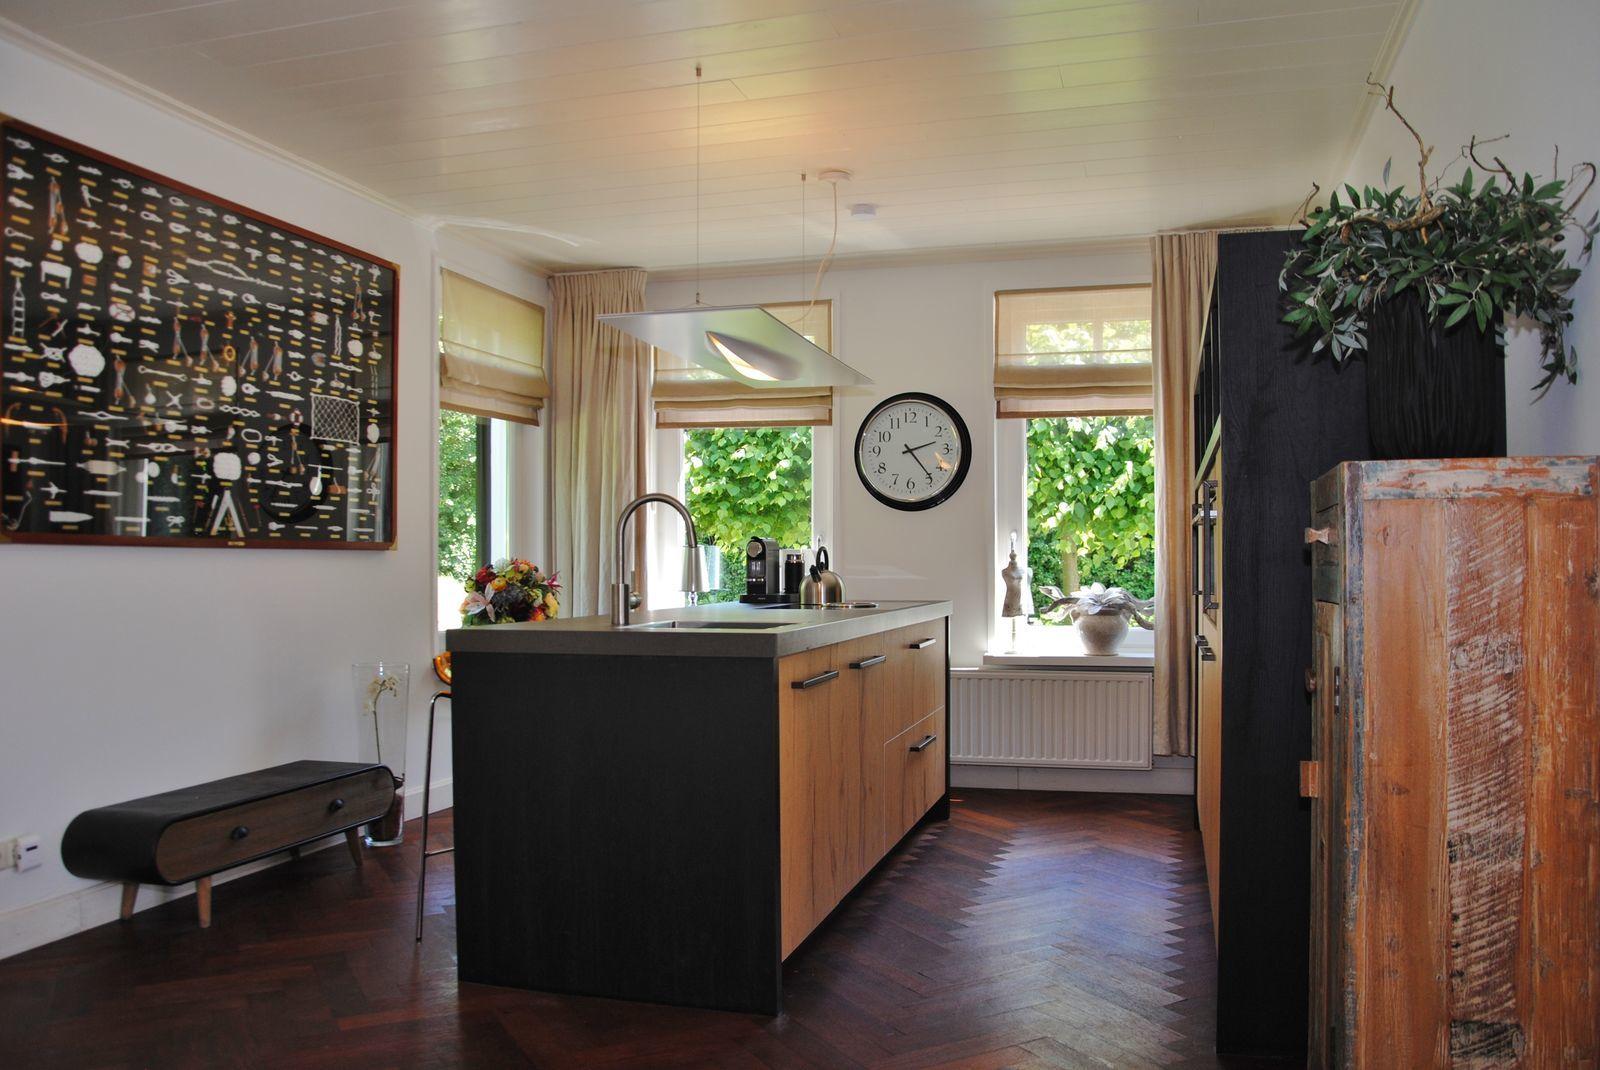 Vakantiehuis Dijkstelweg 46 - 3 personen  - Ouddorp